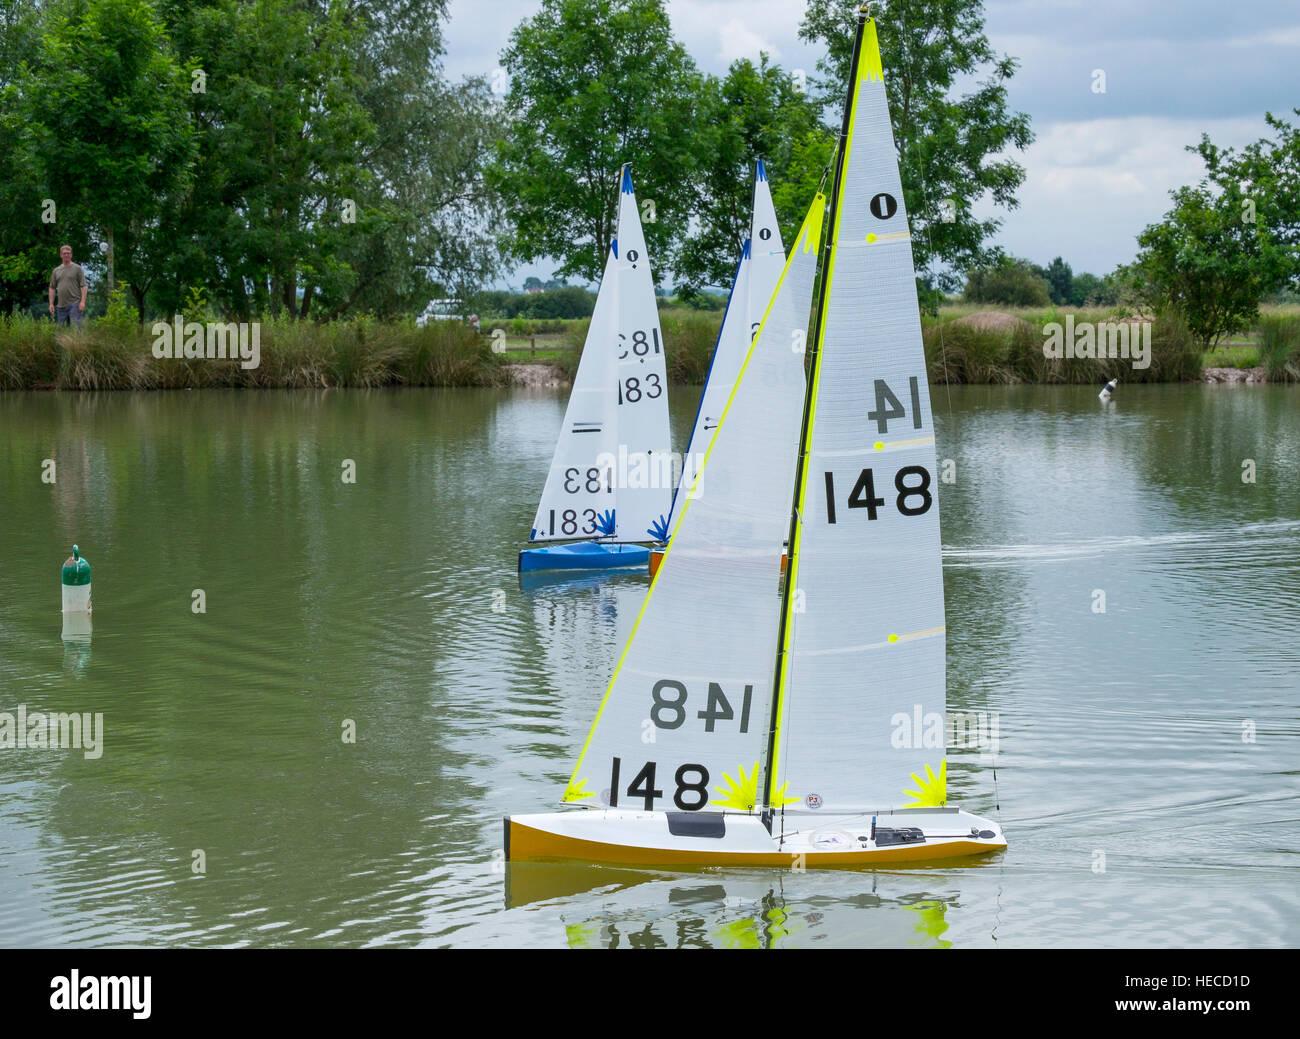 Radio controlled yachts racing. - Stock Image